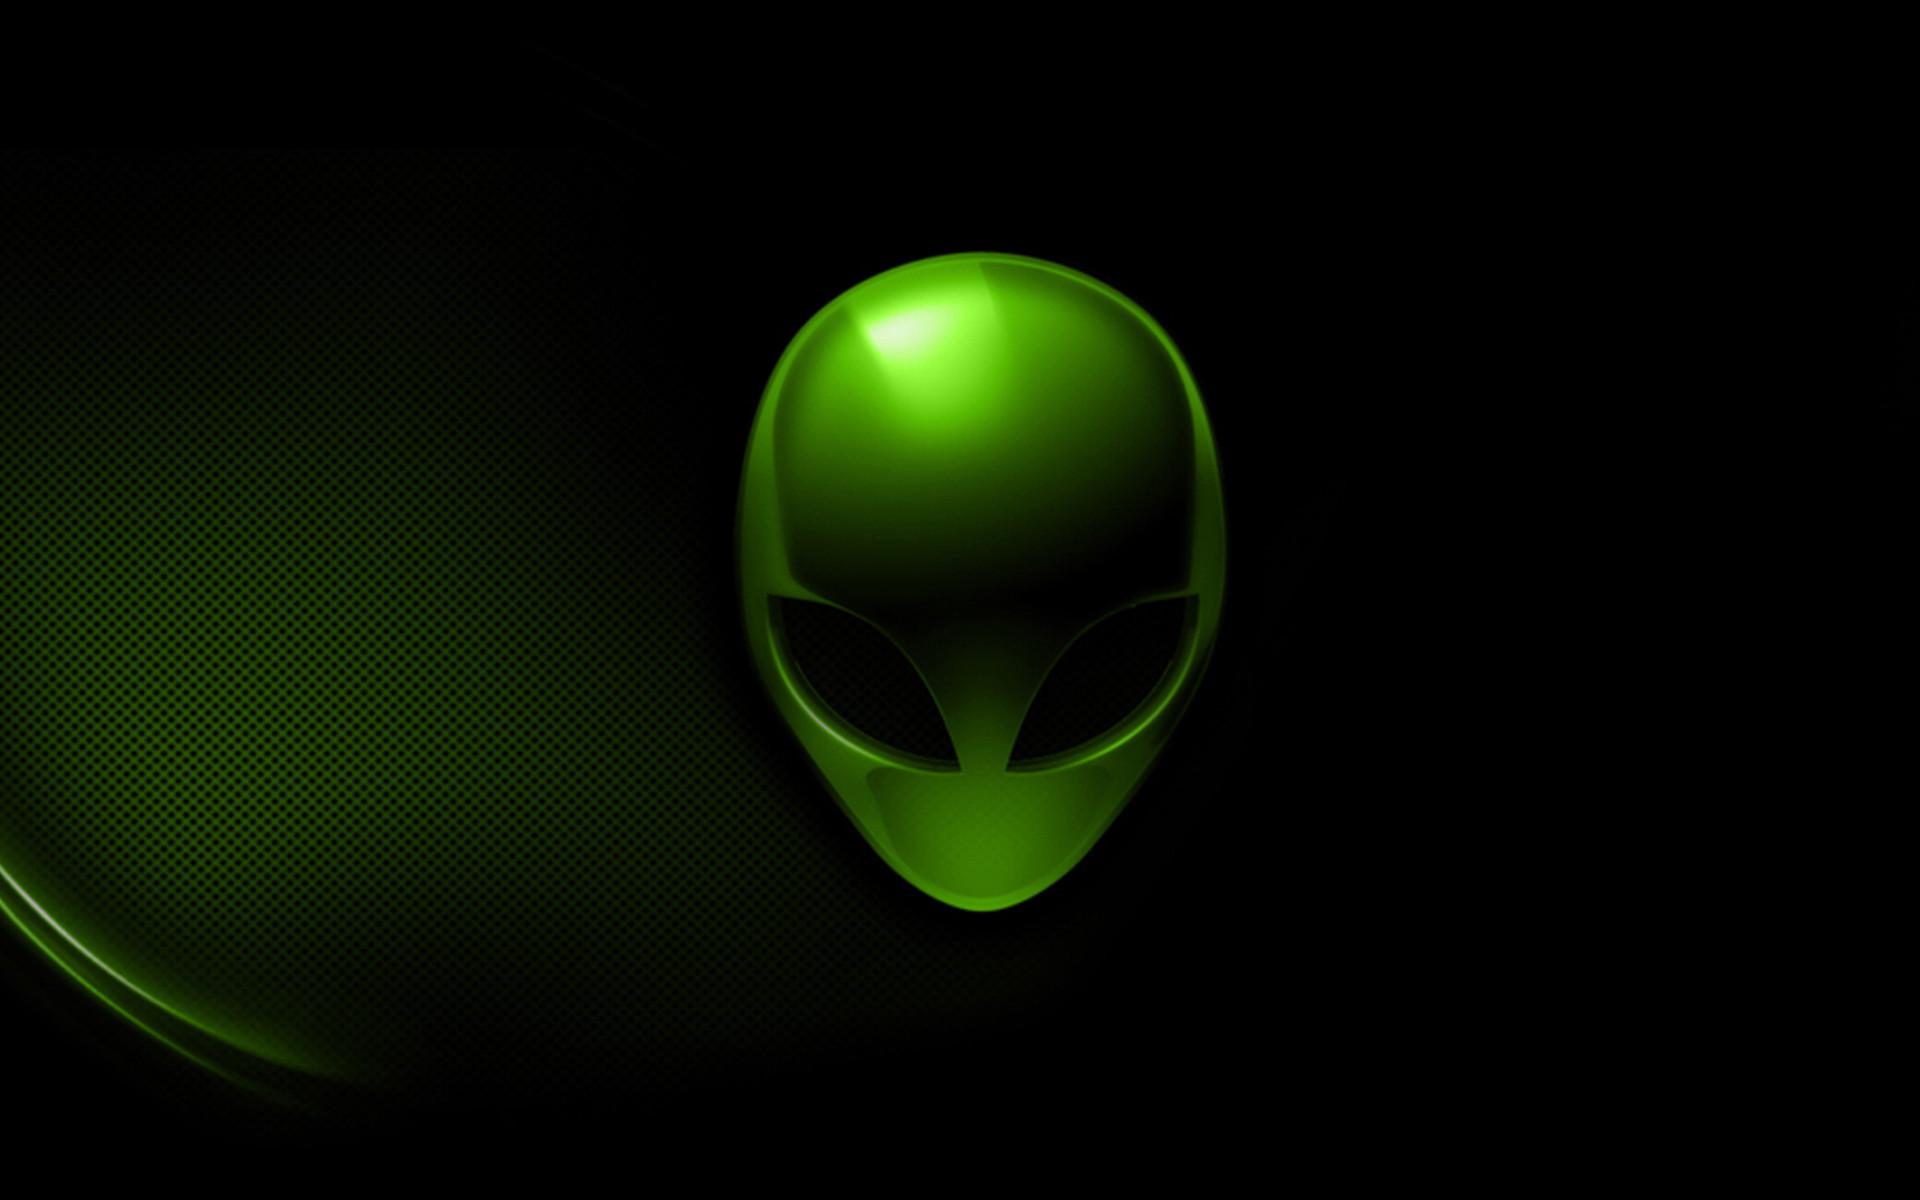 Green Alienware Wallpaper ·① WallpaperTag